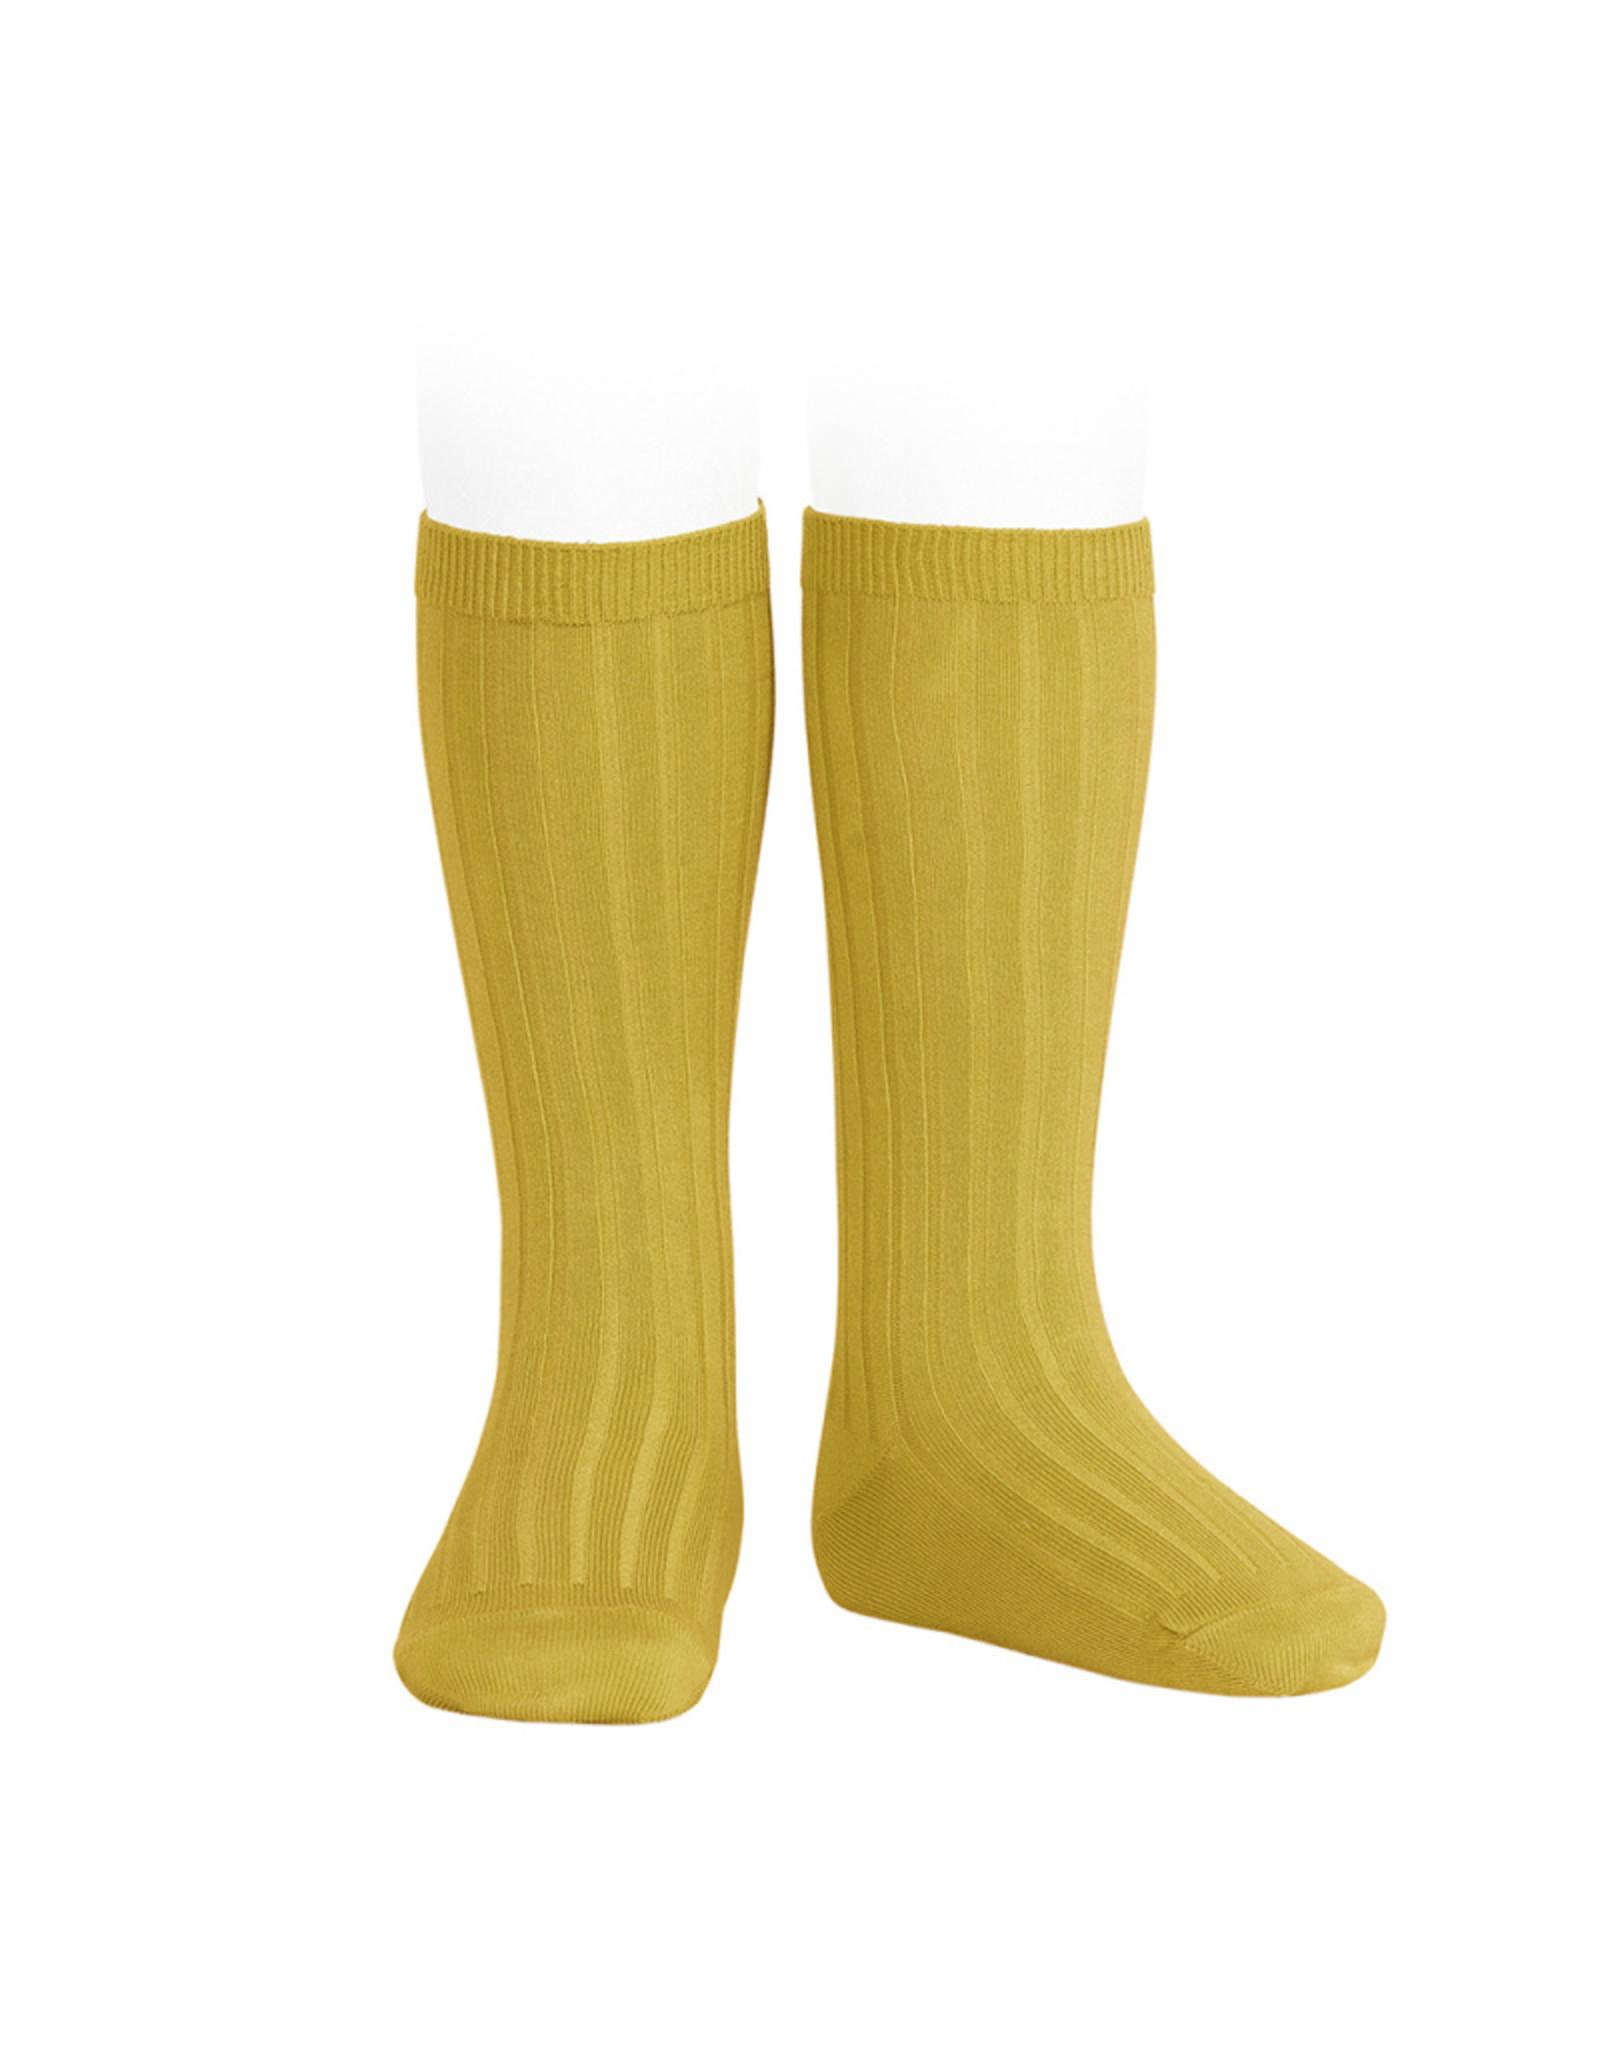 CONDOR Curry Rib Knee High Socks